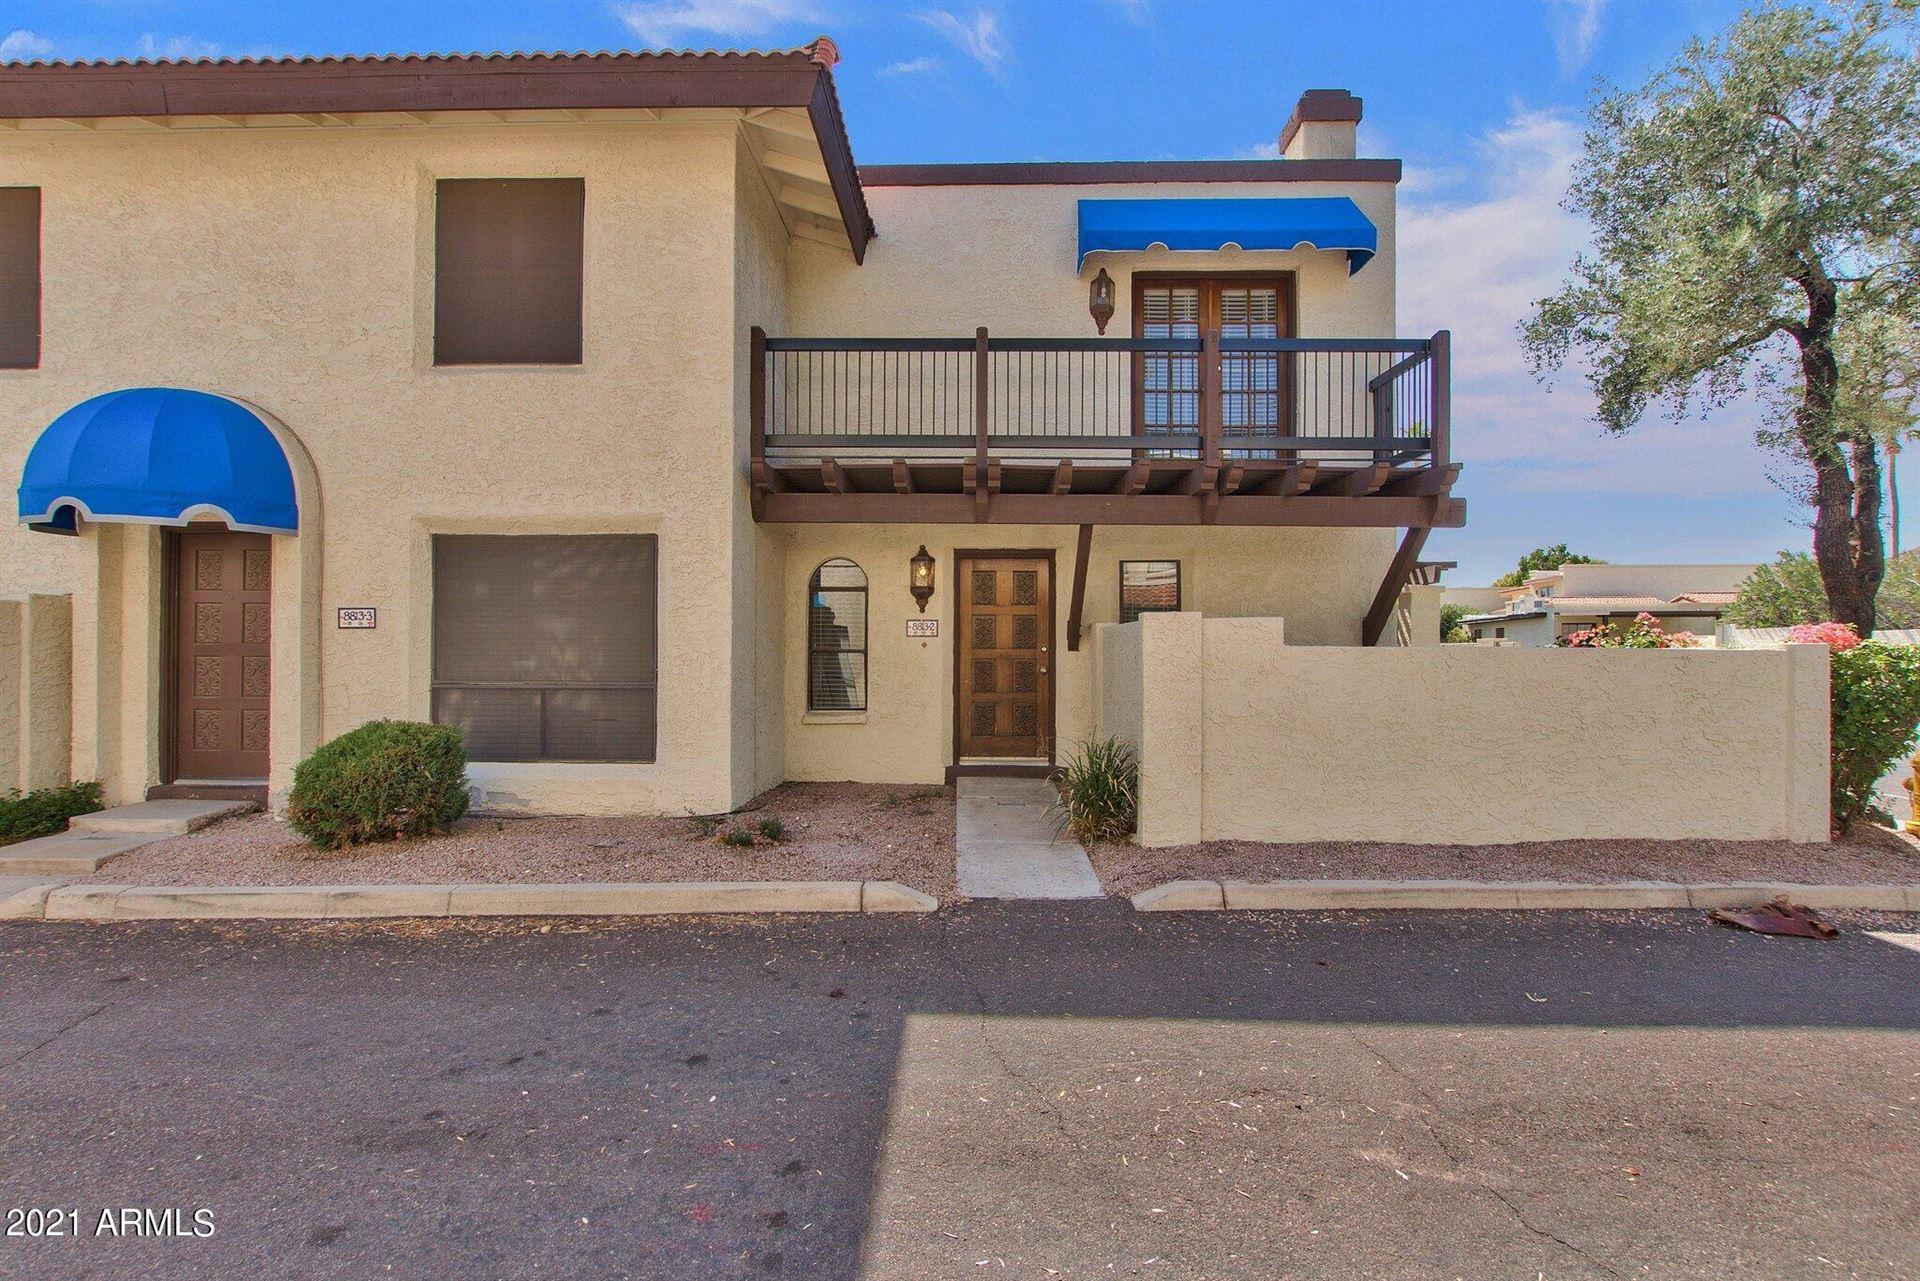 8813 S 48TH Street #2, Phoenix, AZ 85044 - MLS#: 6296907